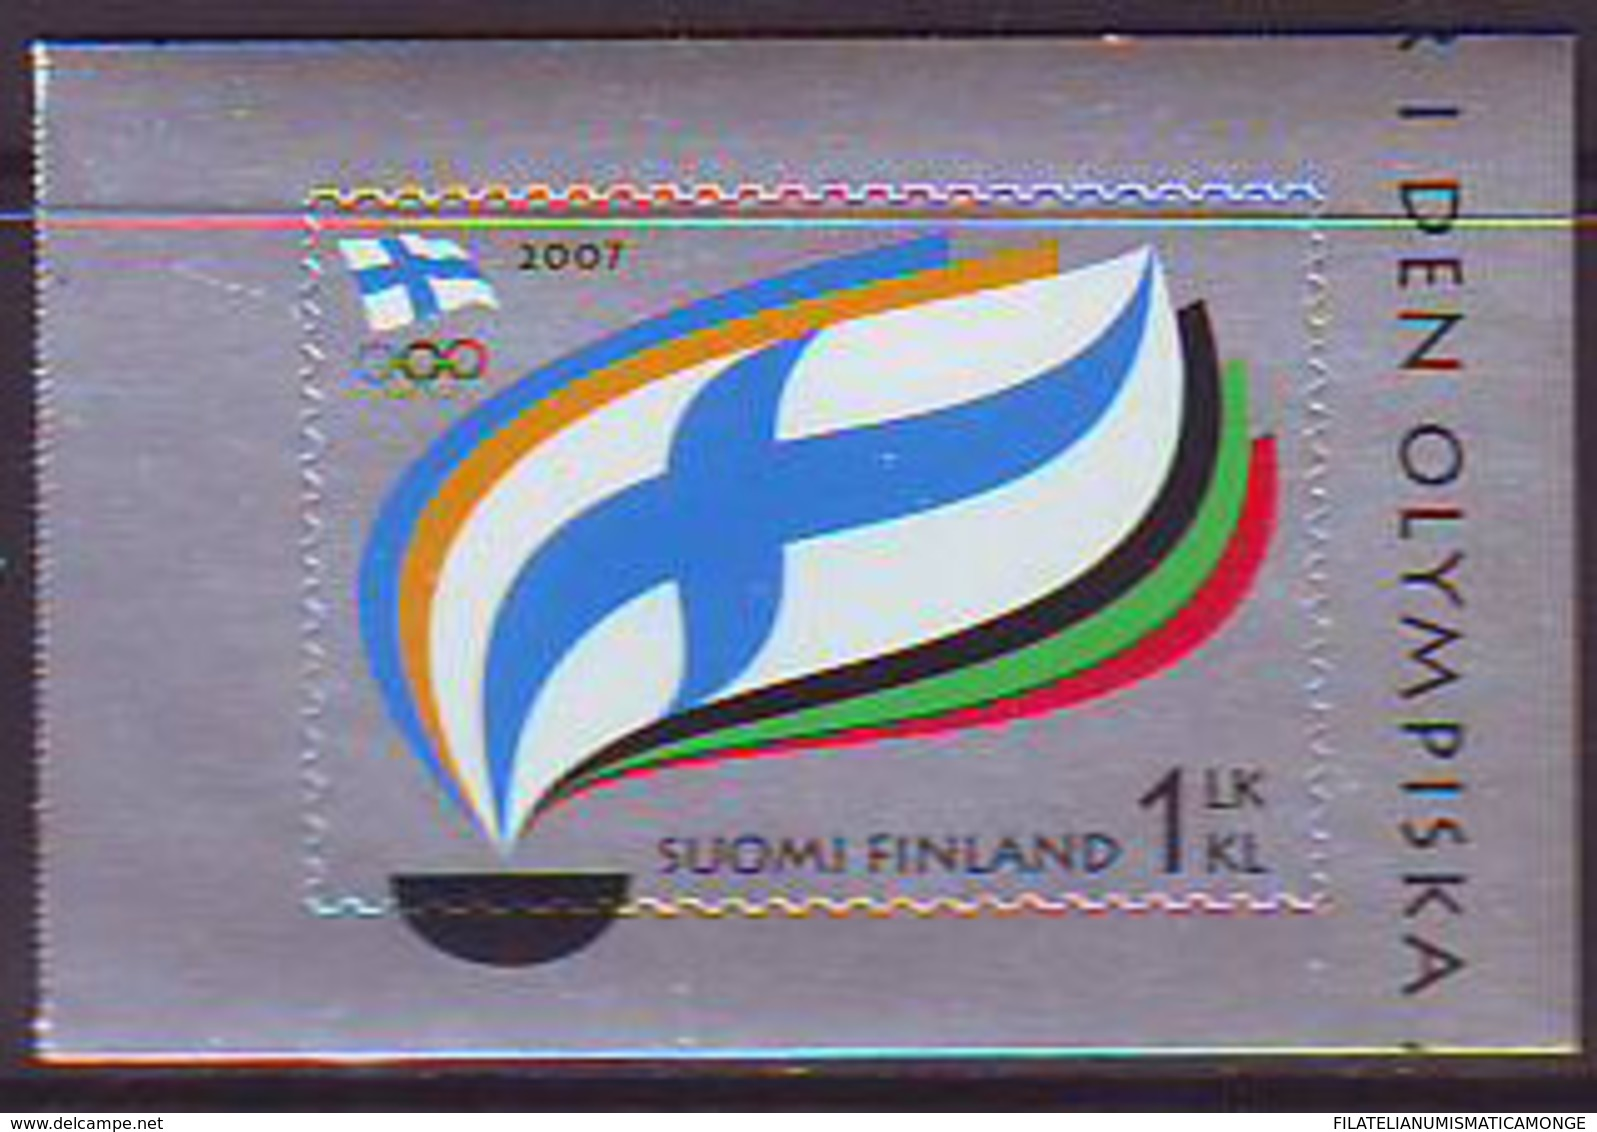 Finlandia 2007  Yvert Tellier  1832 Cent.Comite Olimp.filandes ** - Finland